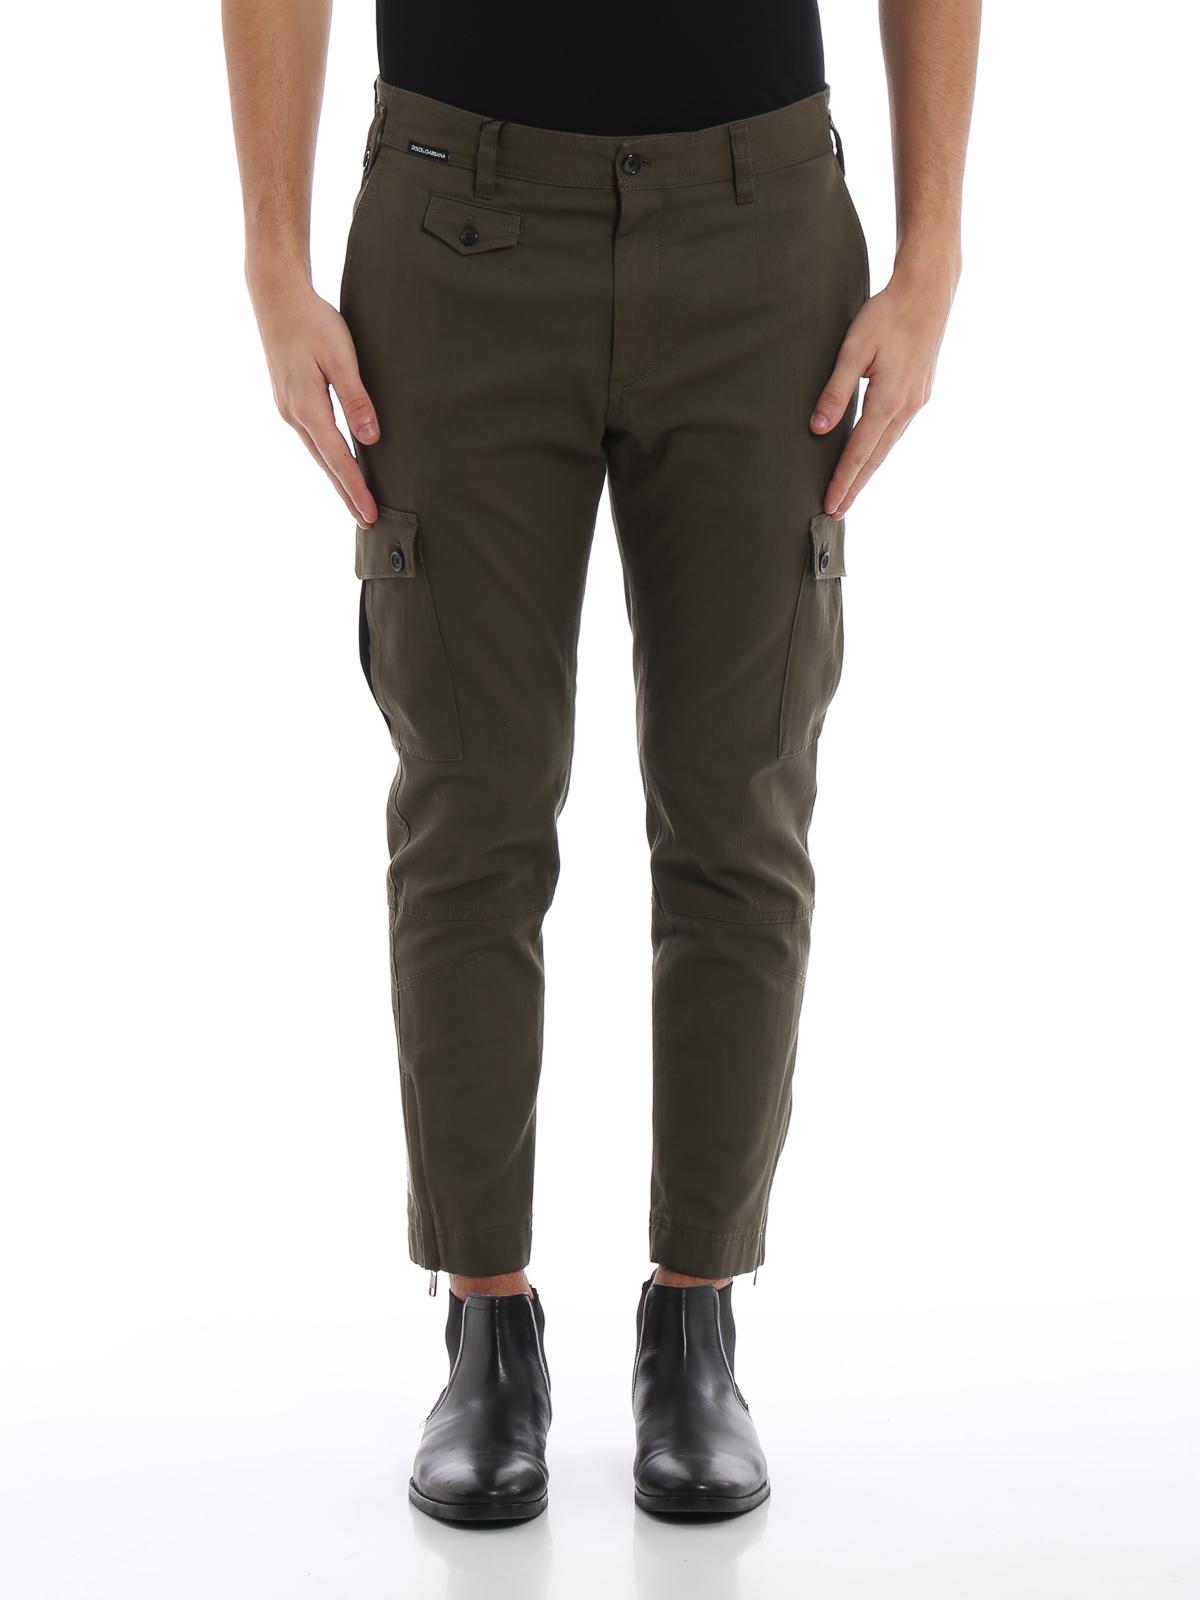 92fb258854 iKRIX DOLCE   GABBANA  Pantalones casual - Pantalón Casual - Verde Oscuro